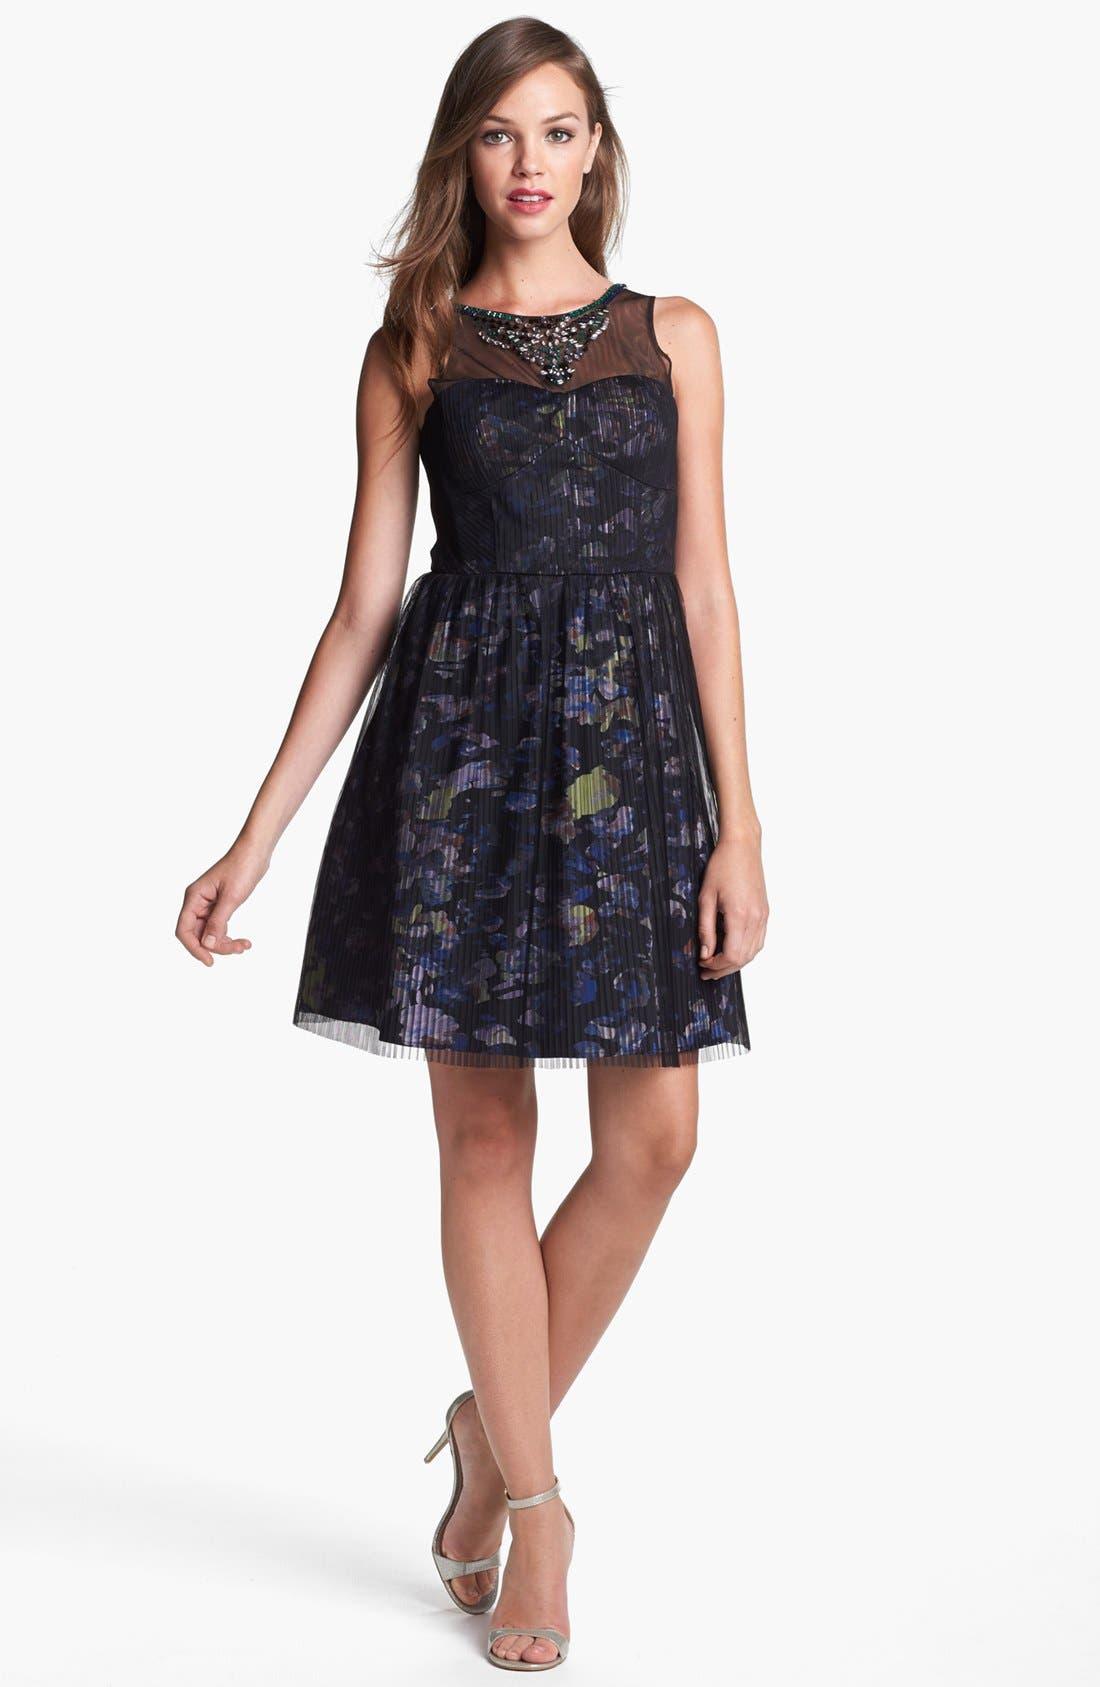 Main Image - BCBGMAXAZRIA 'Illusion' Dress